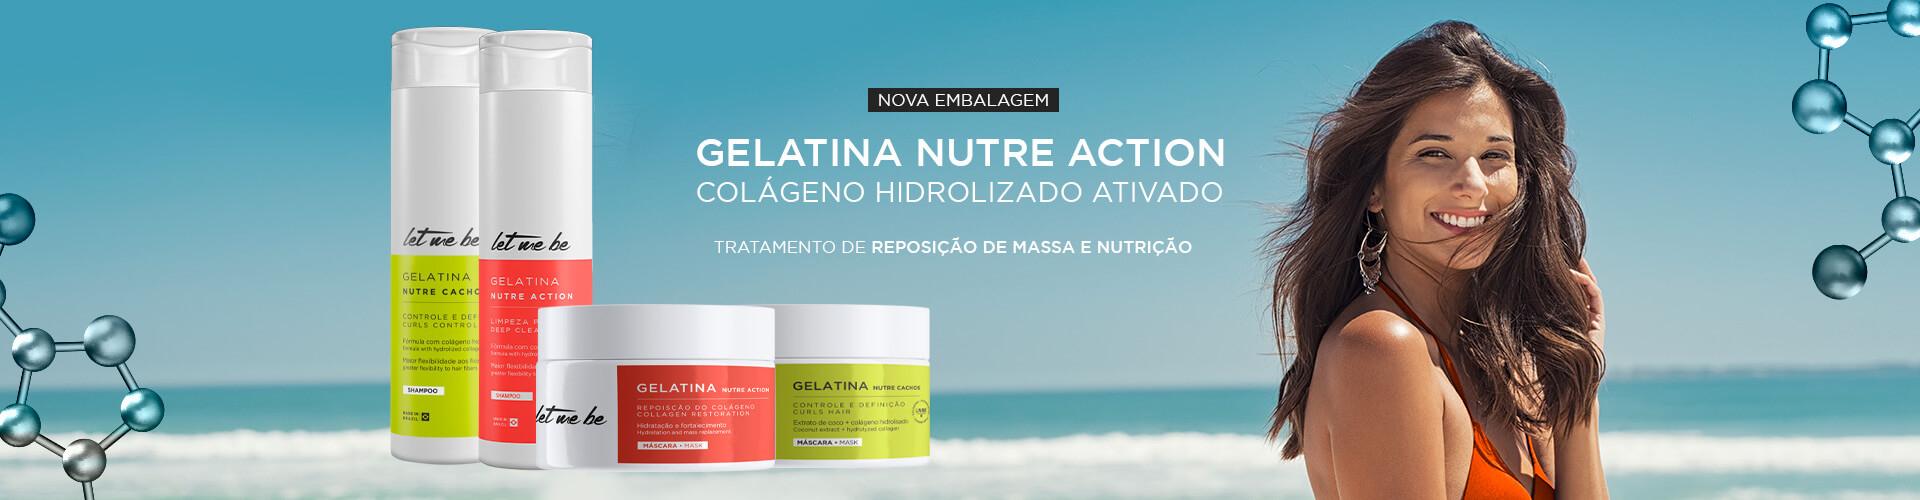 Gelatina Nutre Care